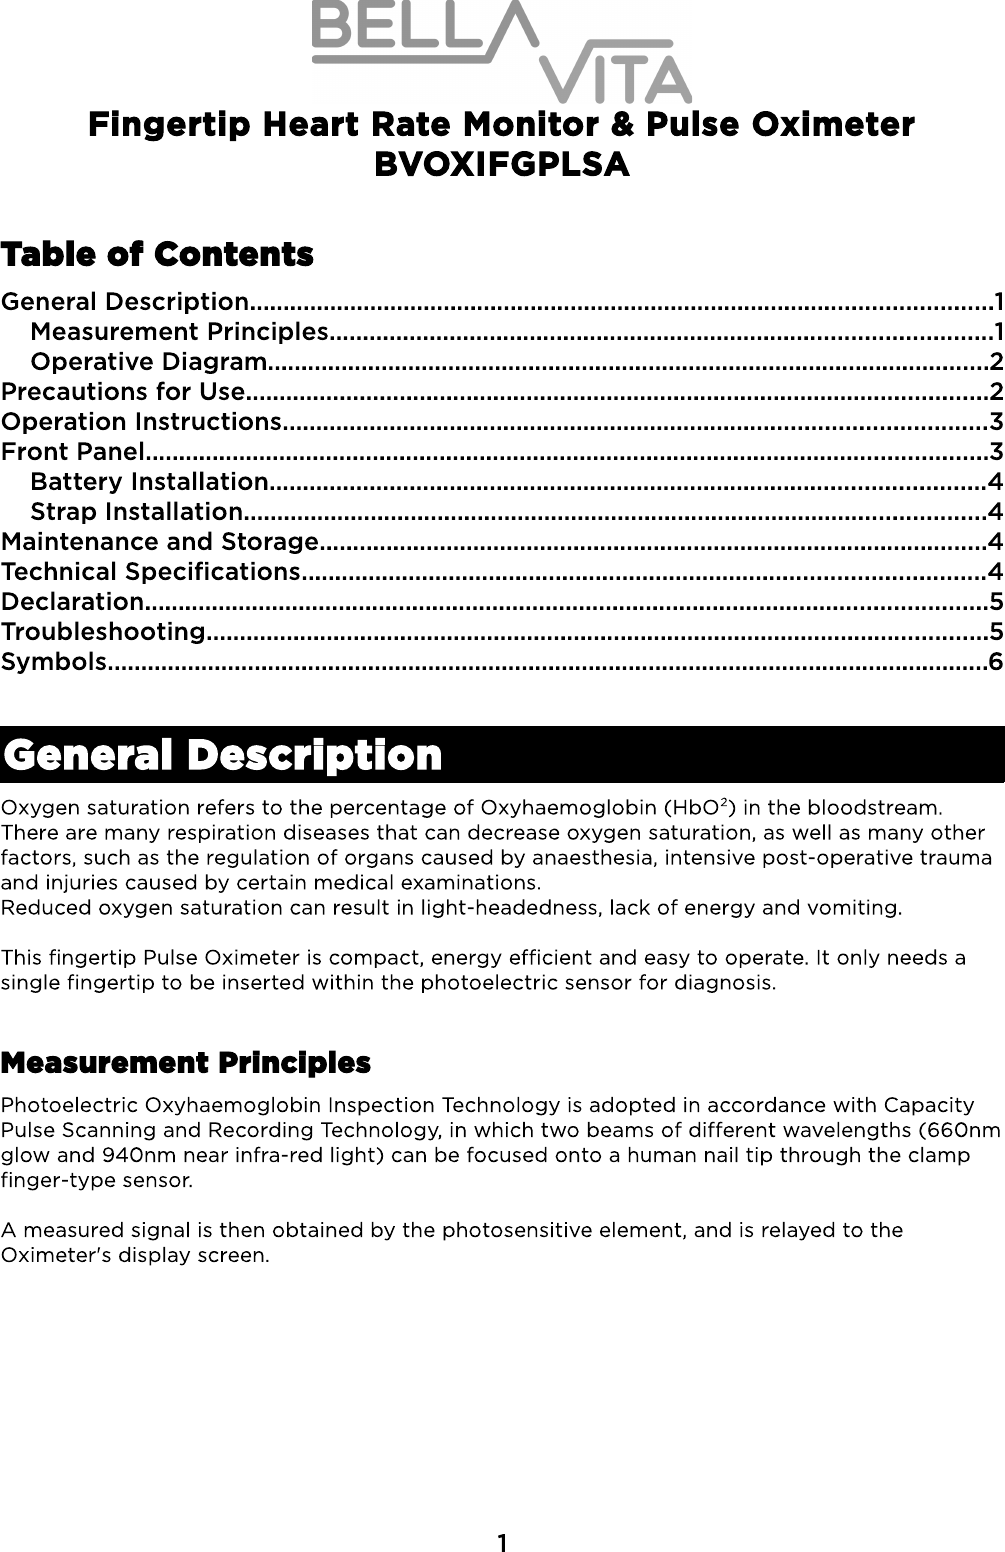 Bvoxifgplsa Fingertip Heart Rate Monitor Pulse Oximeter User Manual A Photoelectric Sensor Wiring Diagram Compact